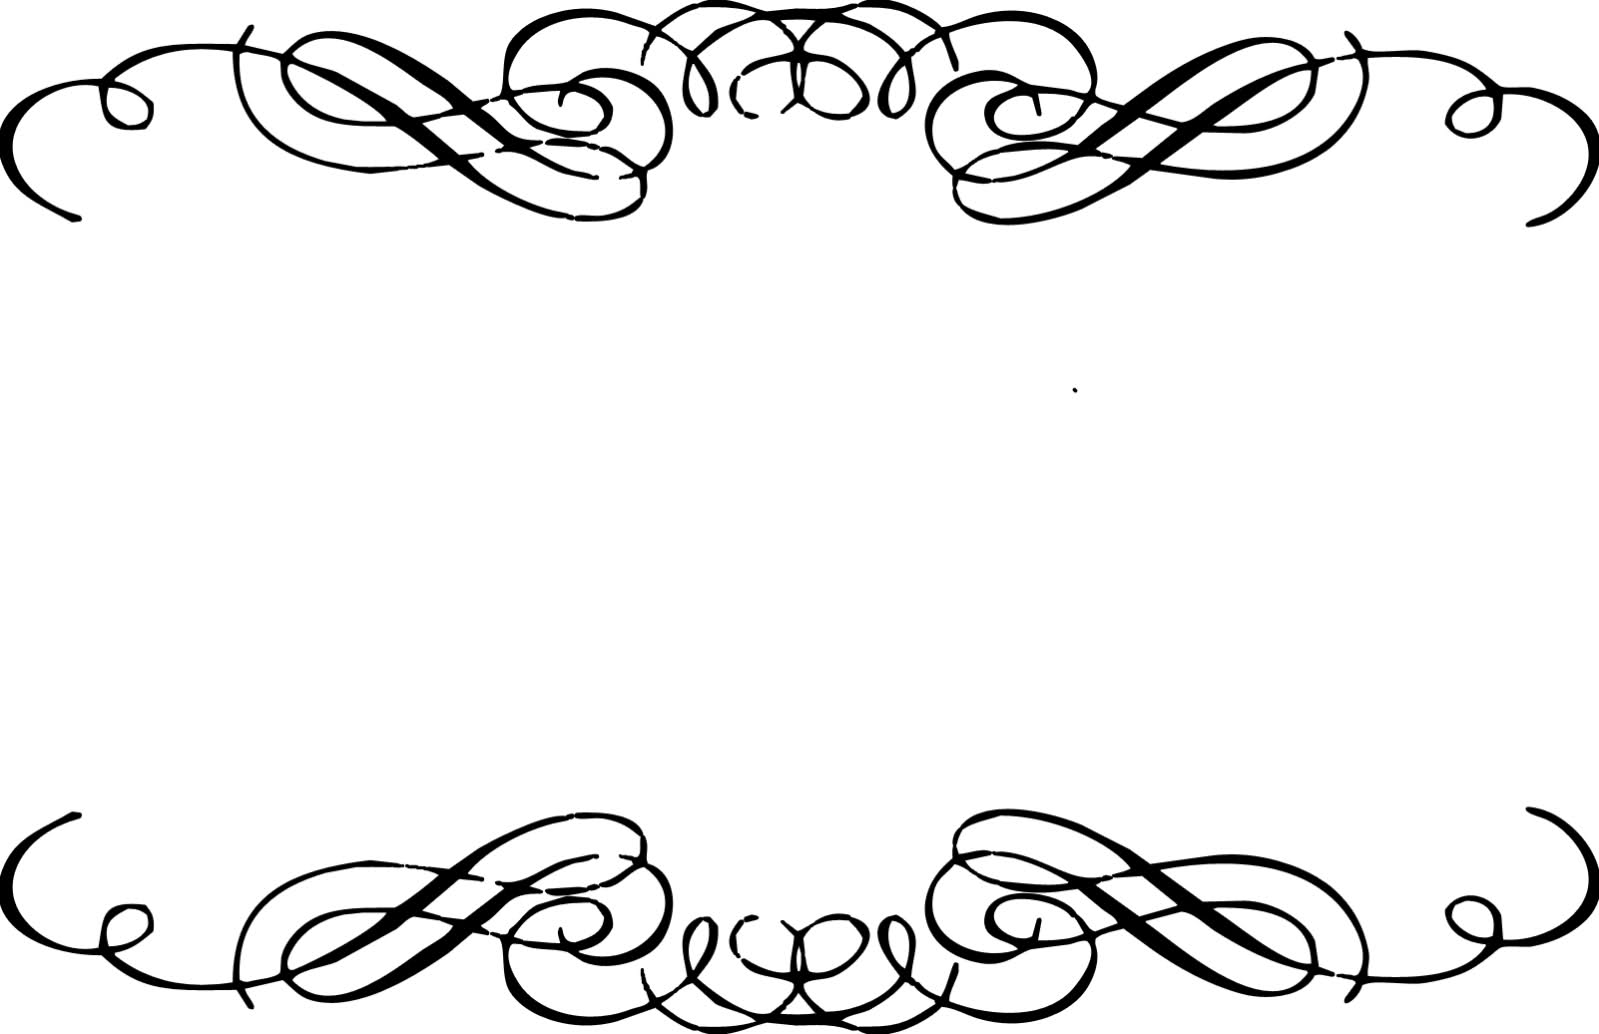 Swirl Border Clipart Swirl Border Clip Art Free Jpg